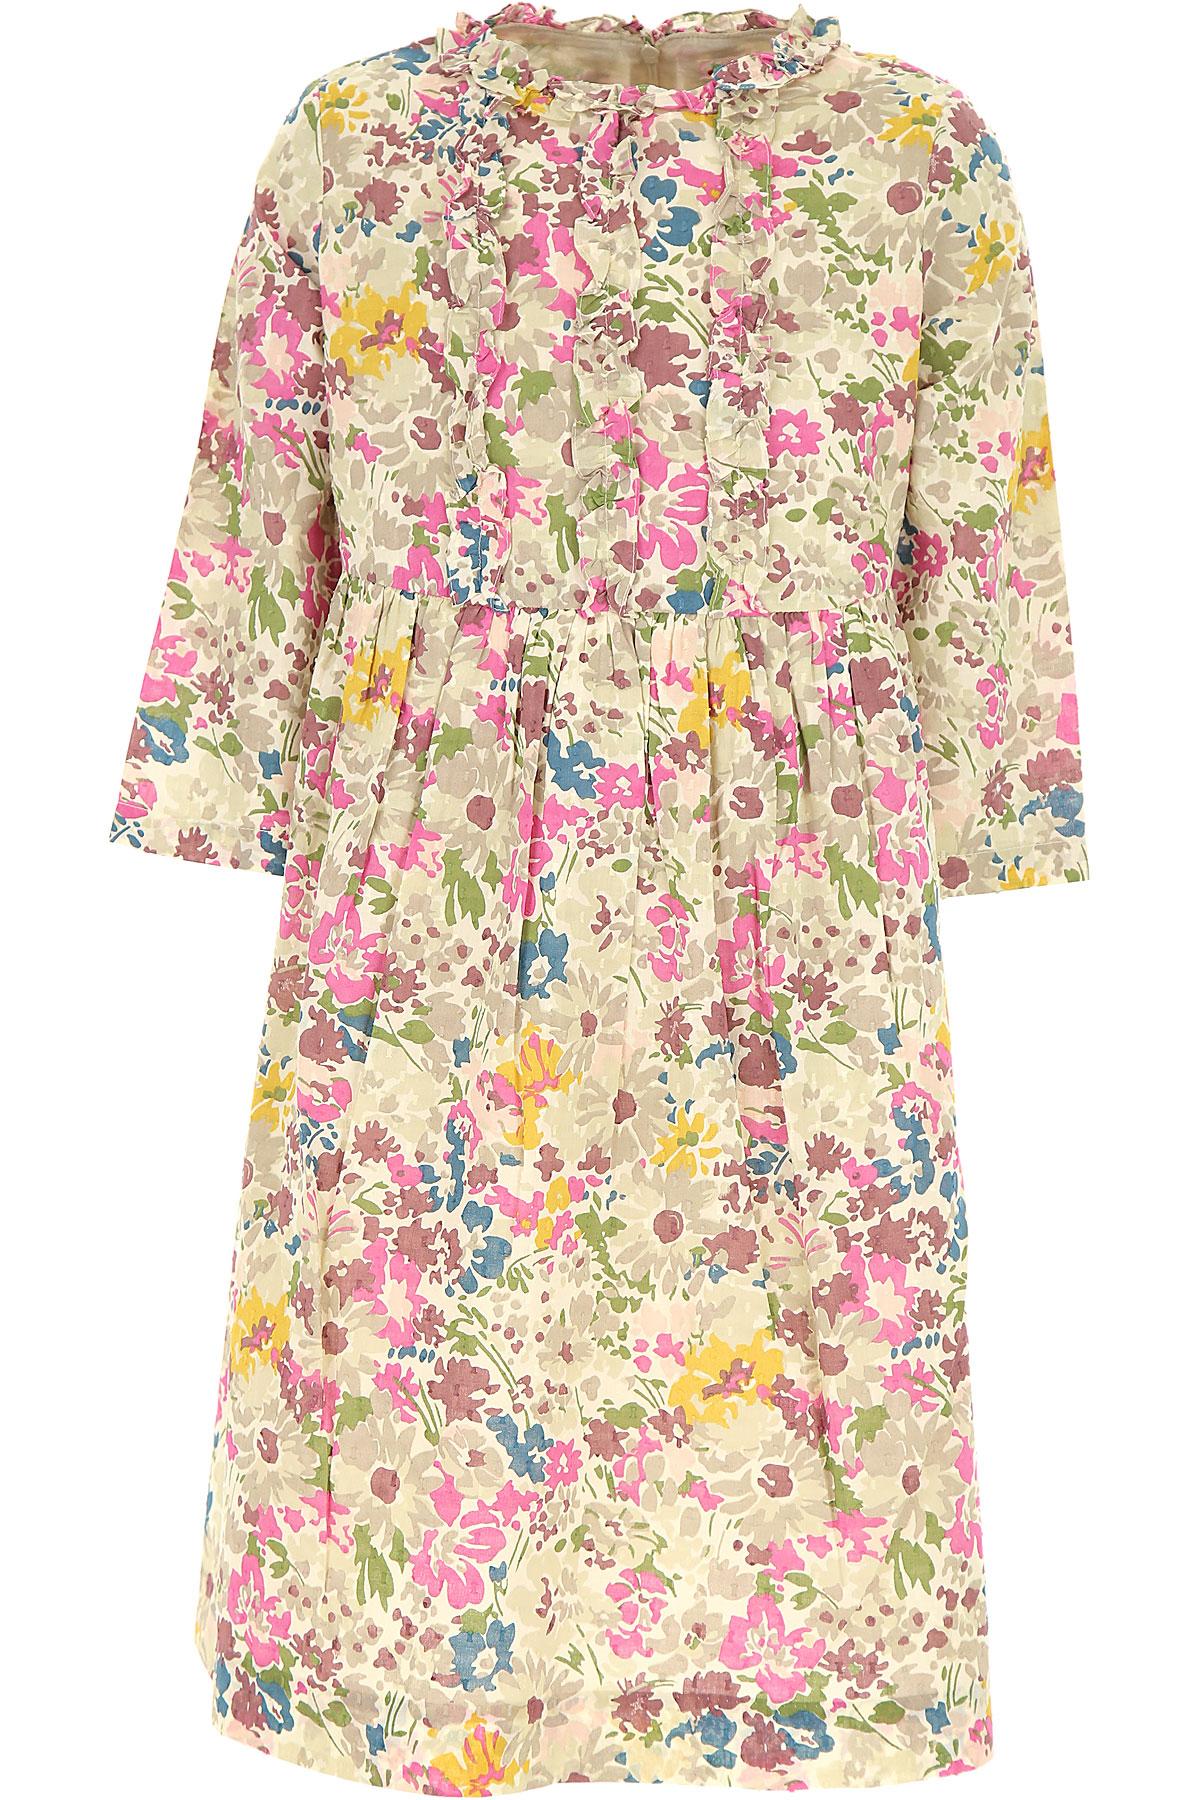 Bonpoint Girls Dress On Sale, Cream, Cotton, 2019, 10Y 12Y